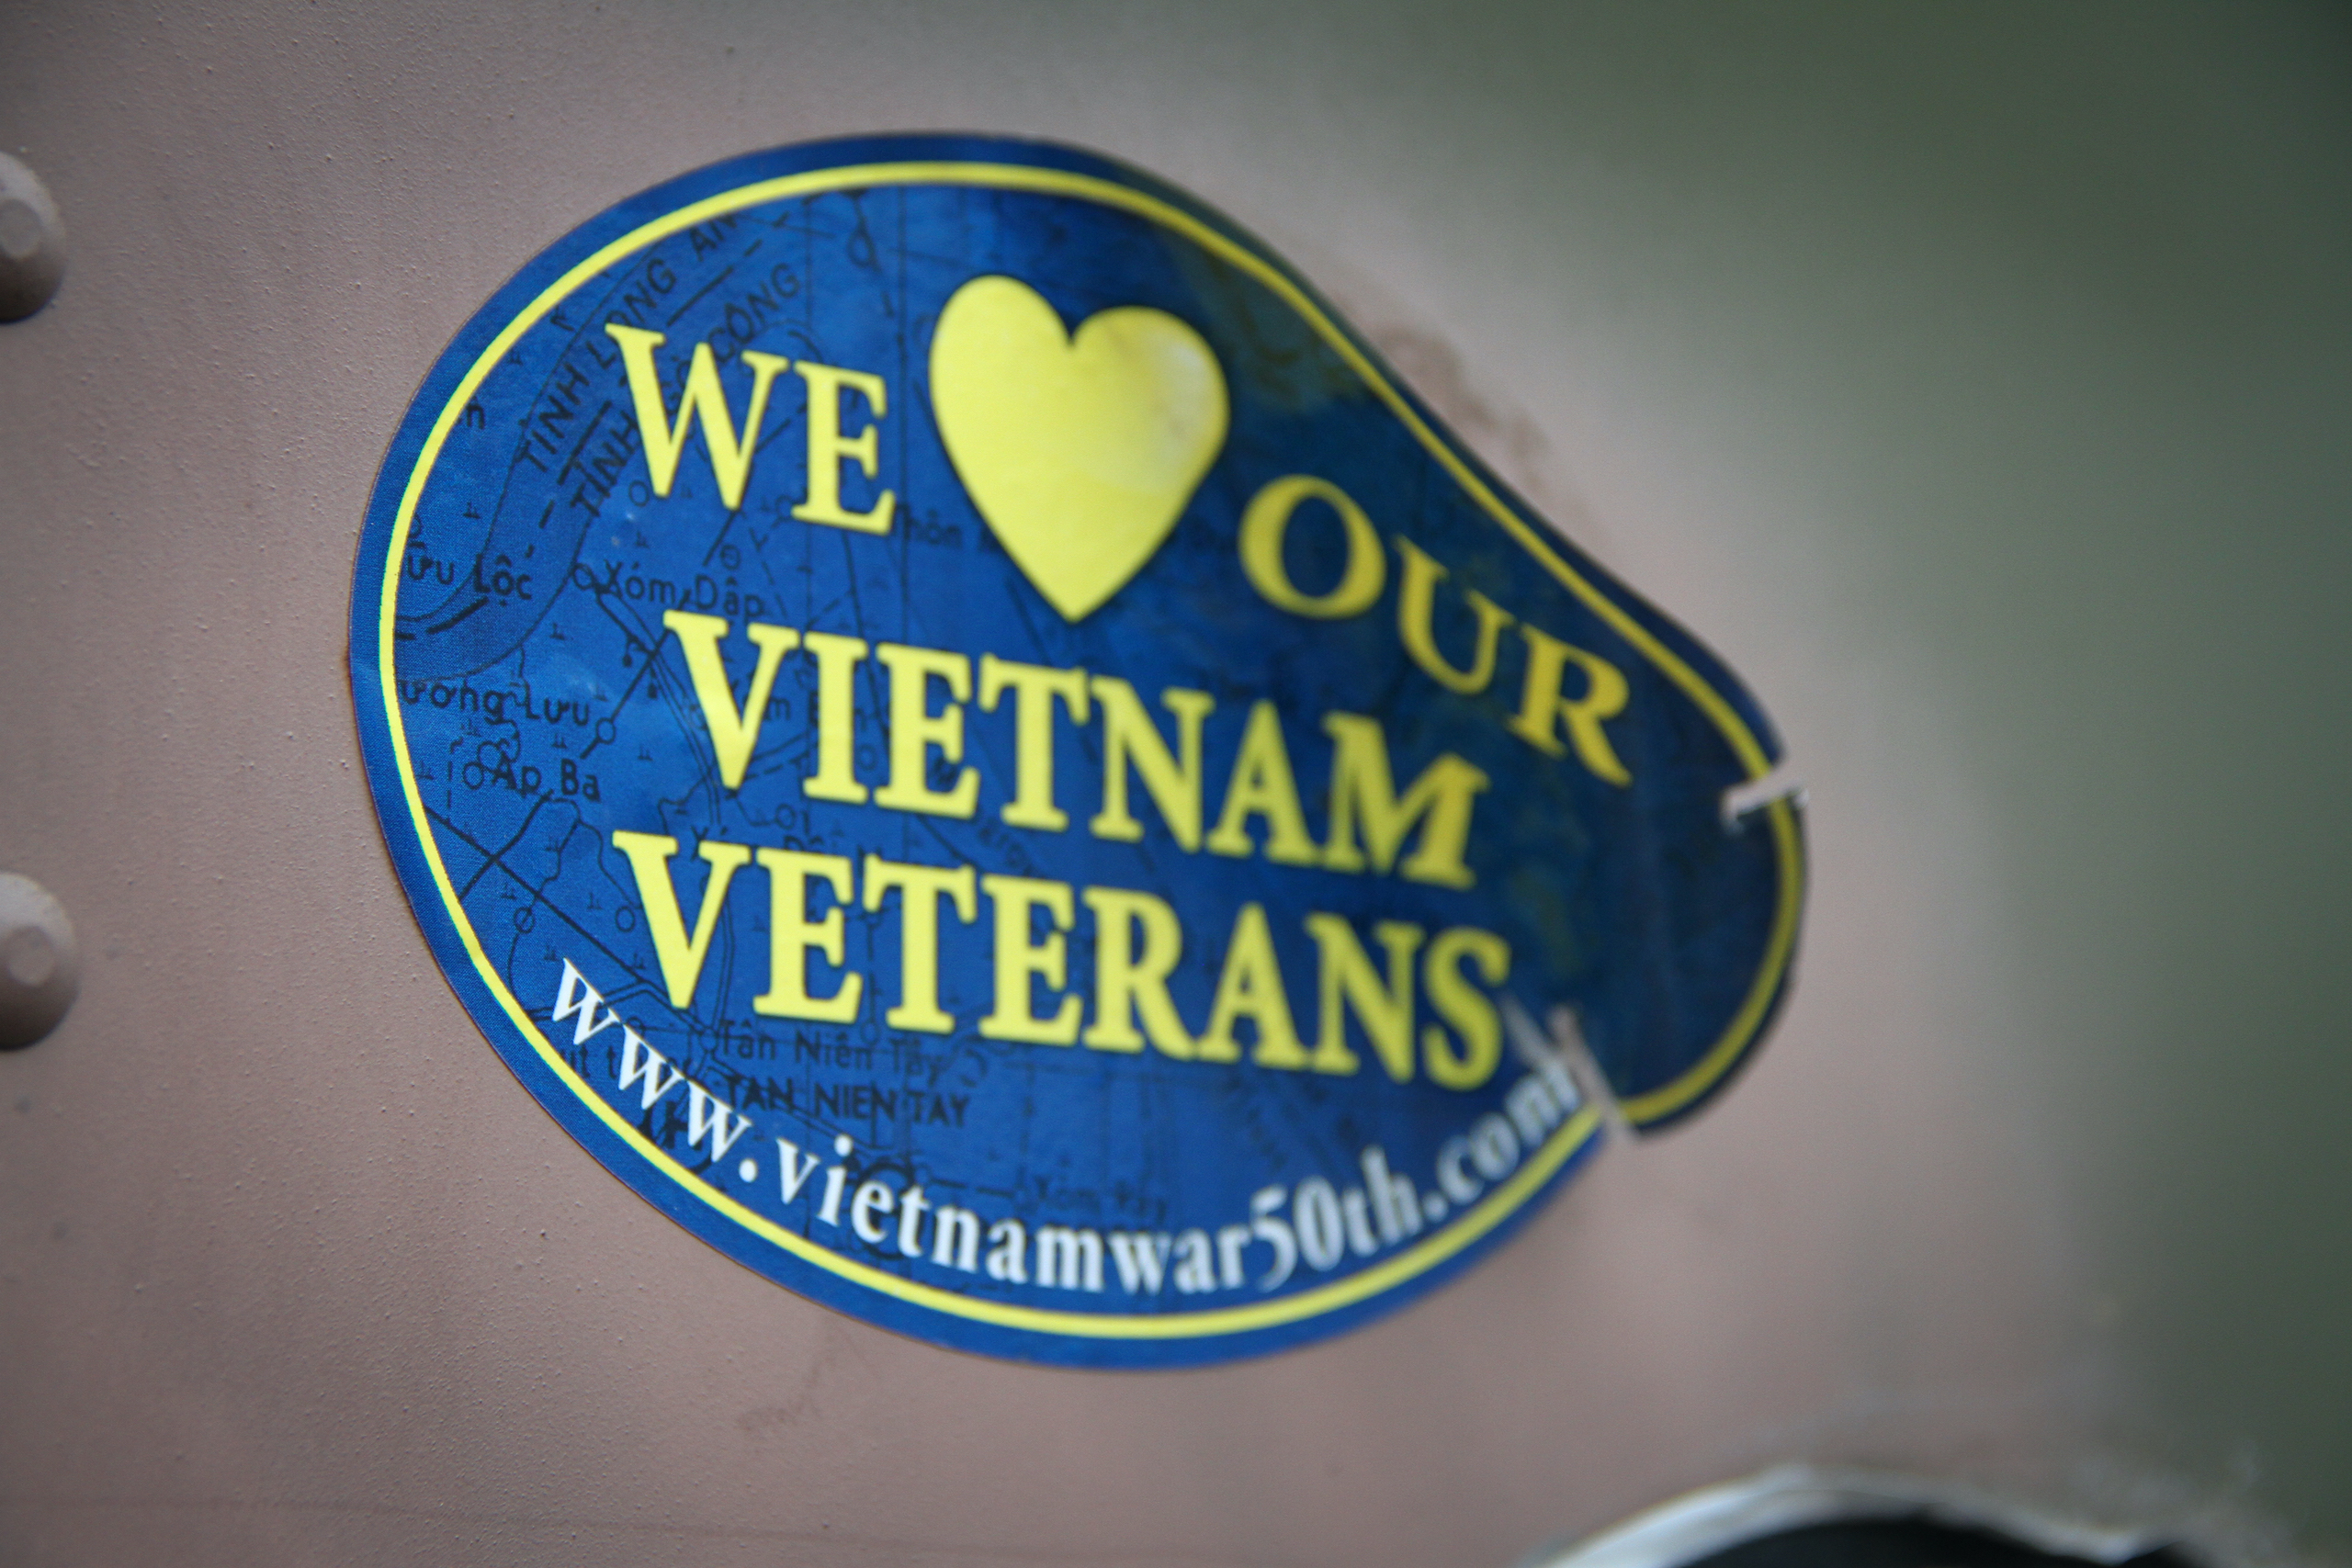 Military vehicle convoy vietnam vets sticker